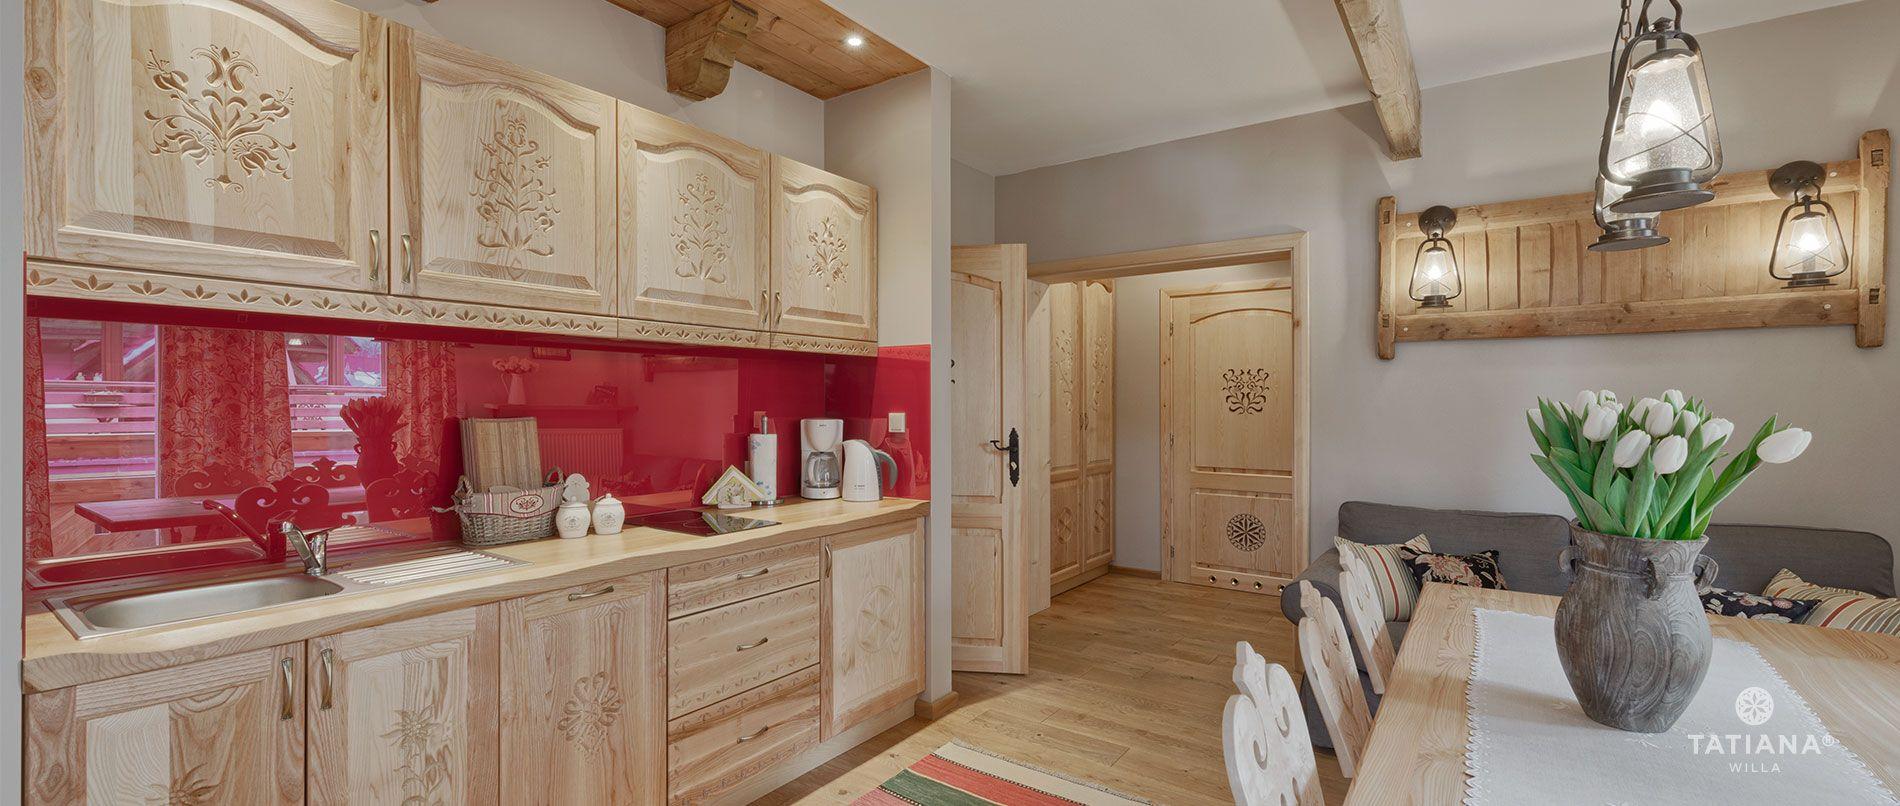 Apartament Lux 15- aneks kuchenny